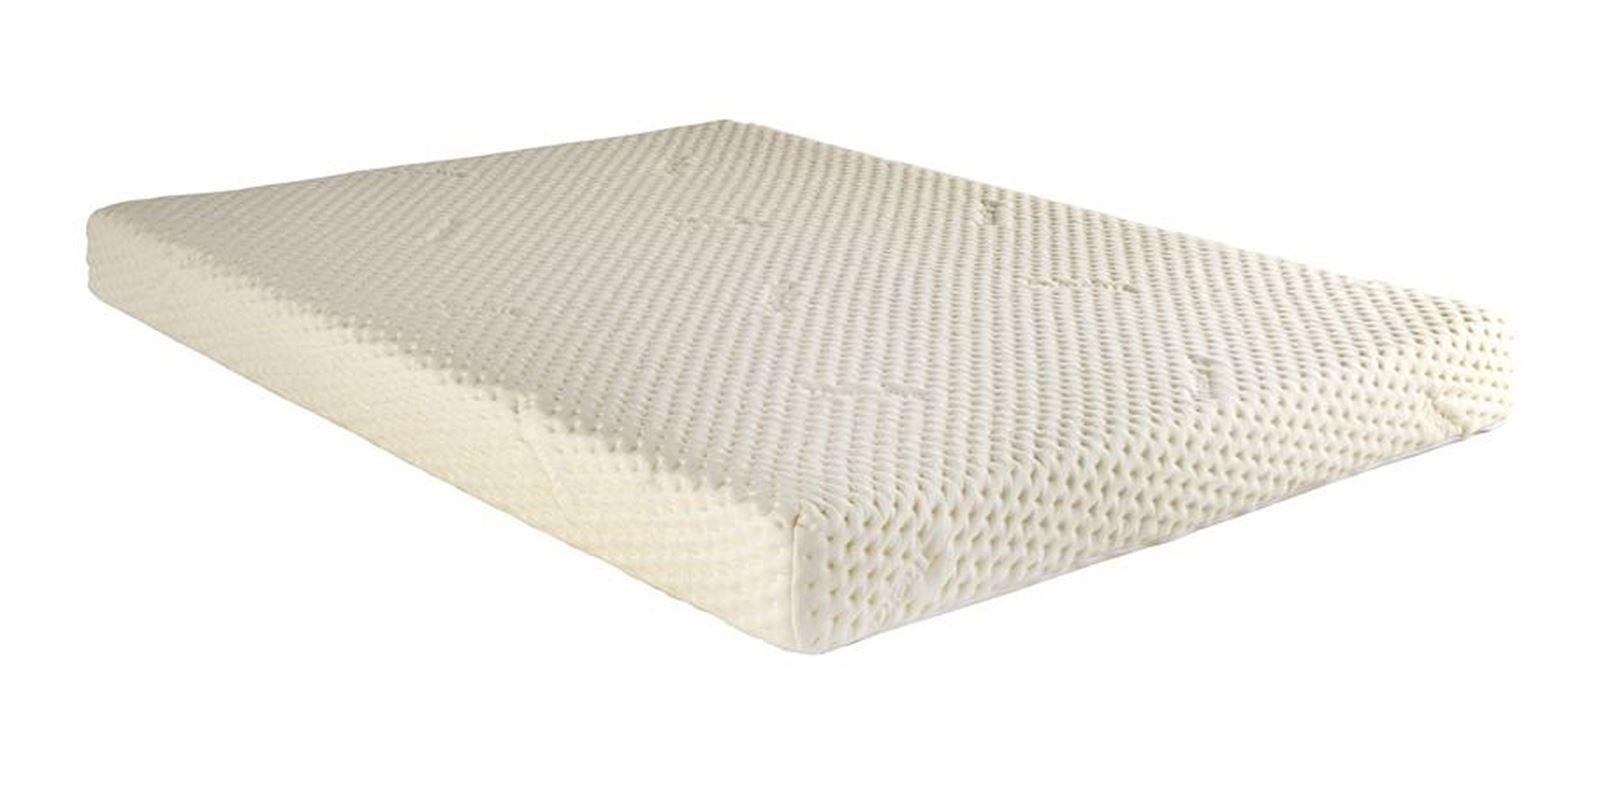 memory foam mattress double 6 inch modern furniture direct. Black Bedroom Furniture Sets. Home Design Ideas